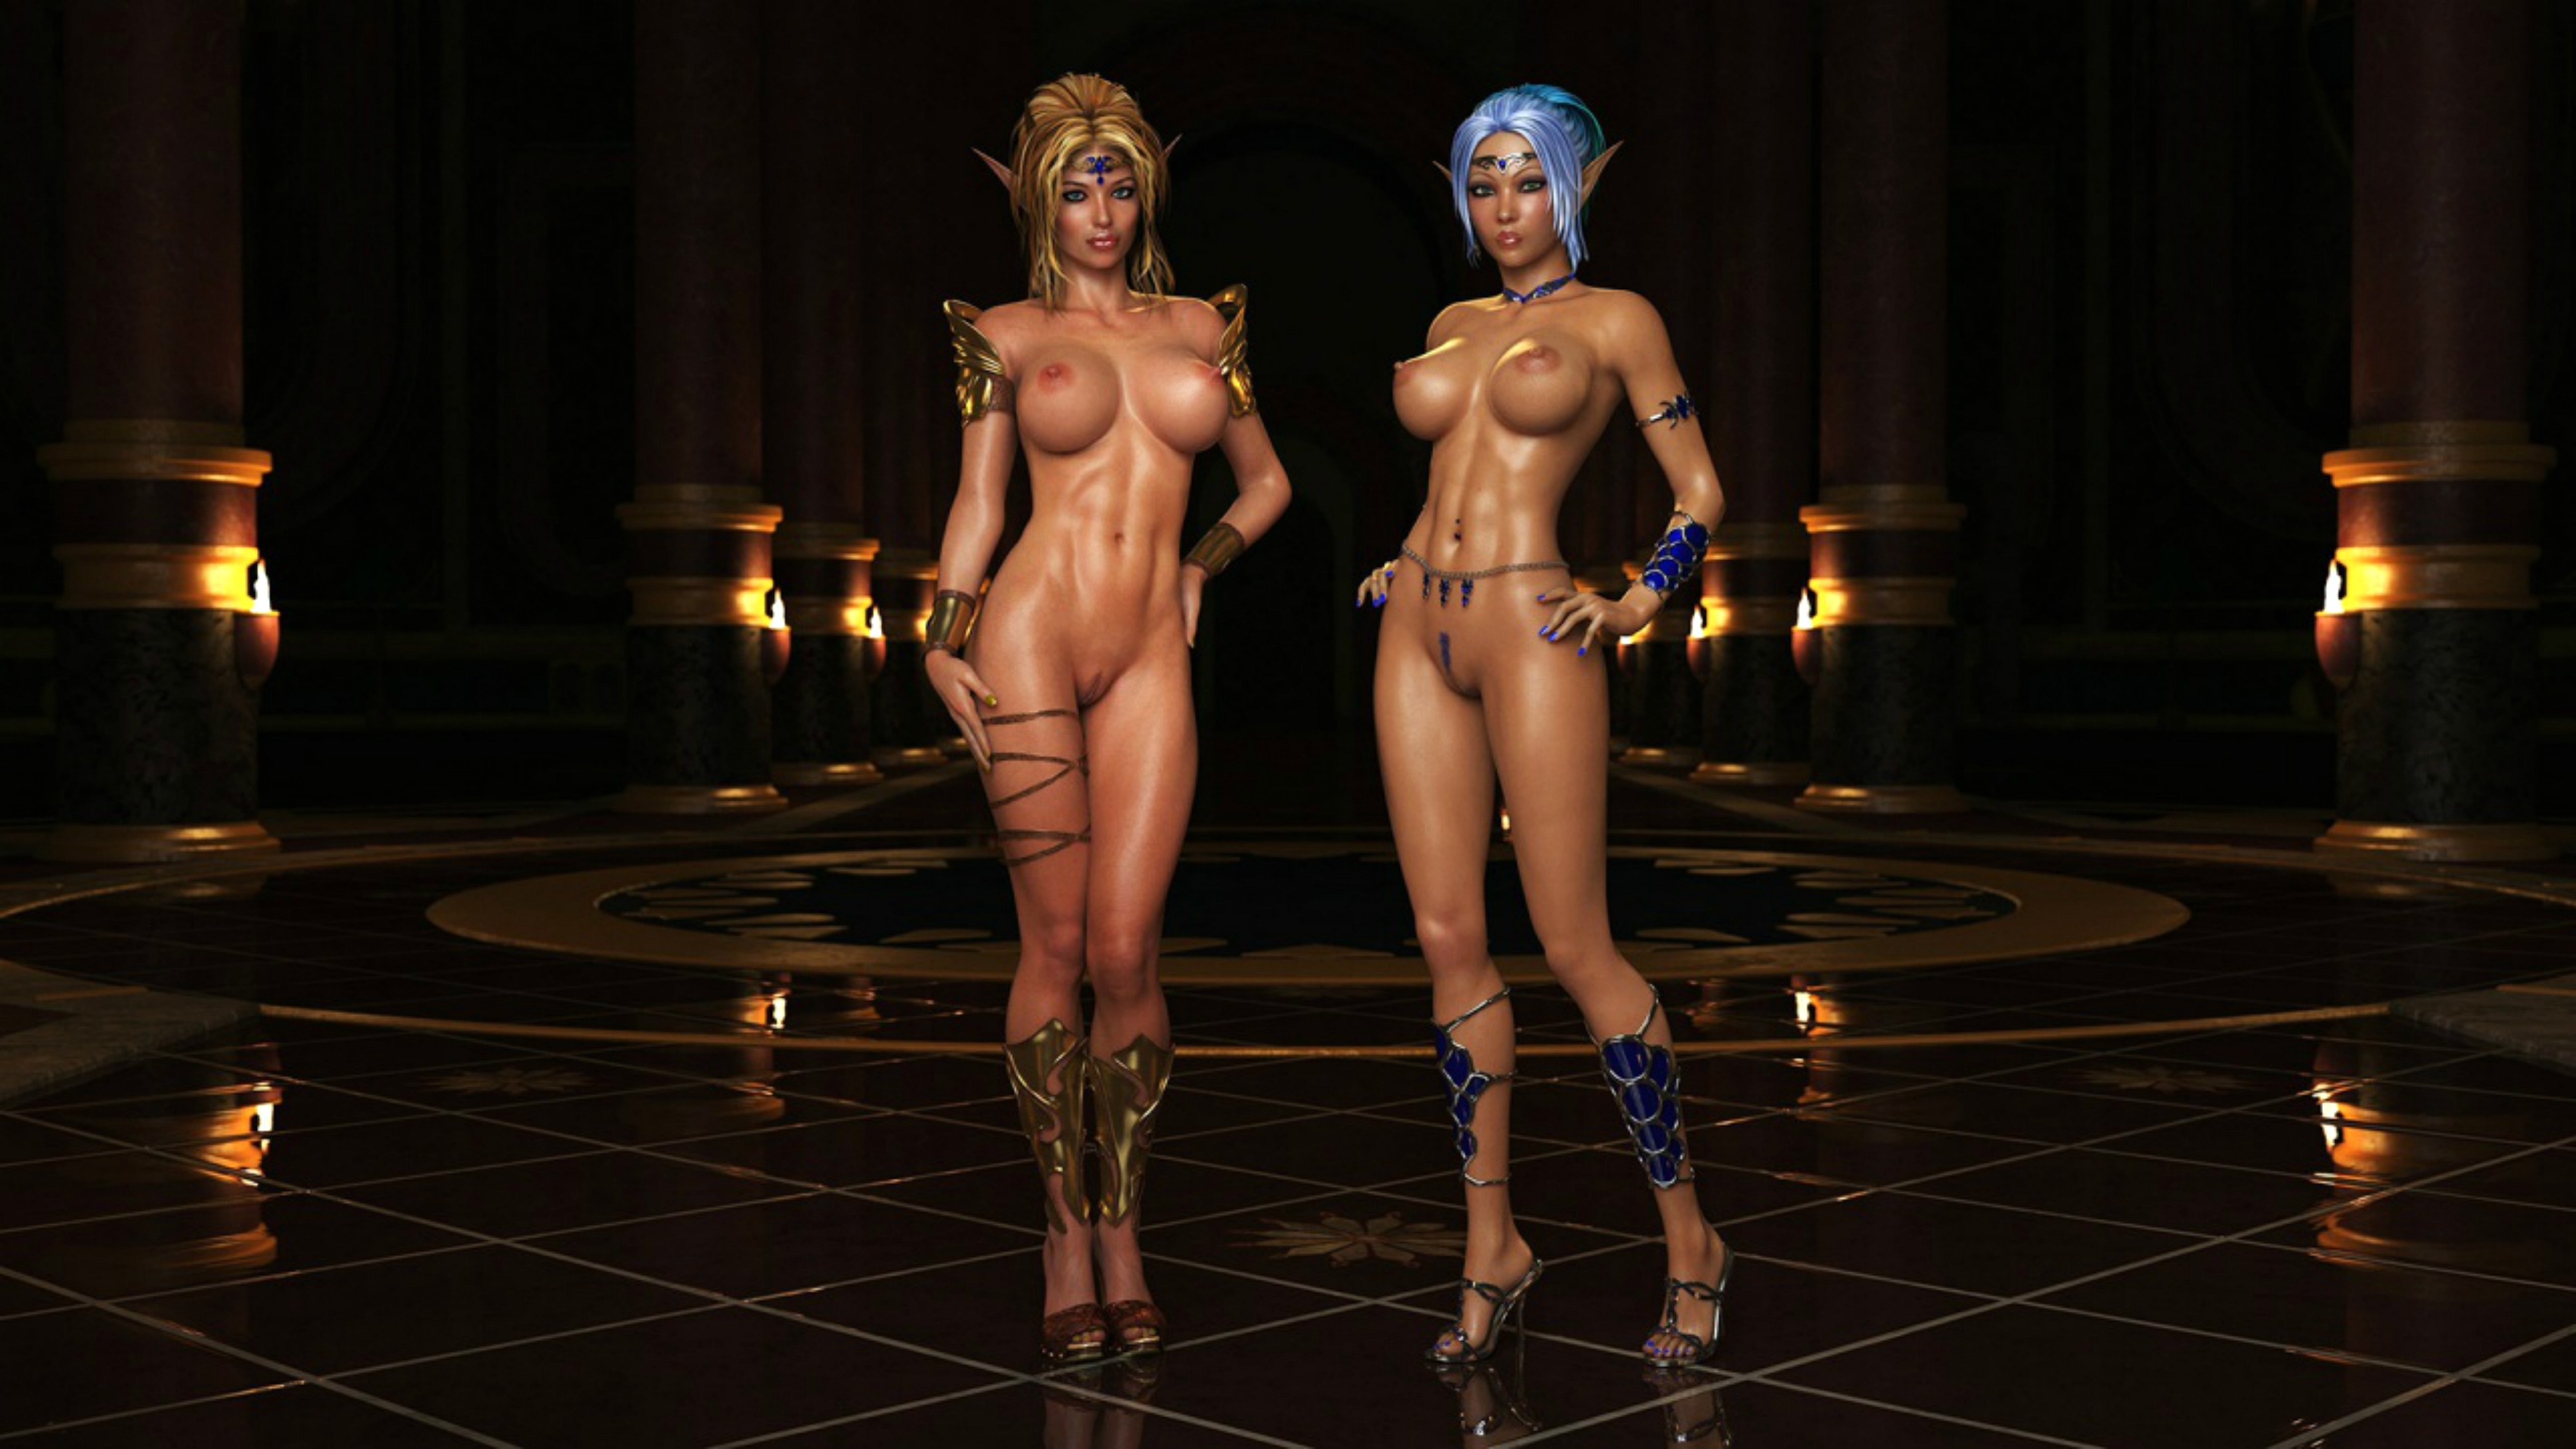 Art erotic fi sci